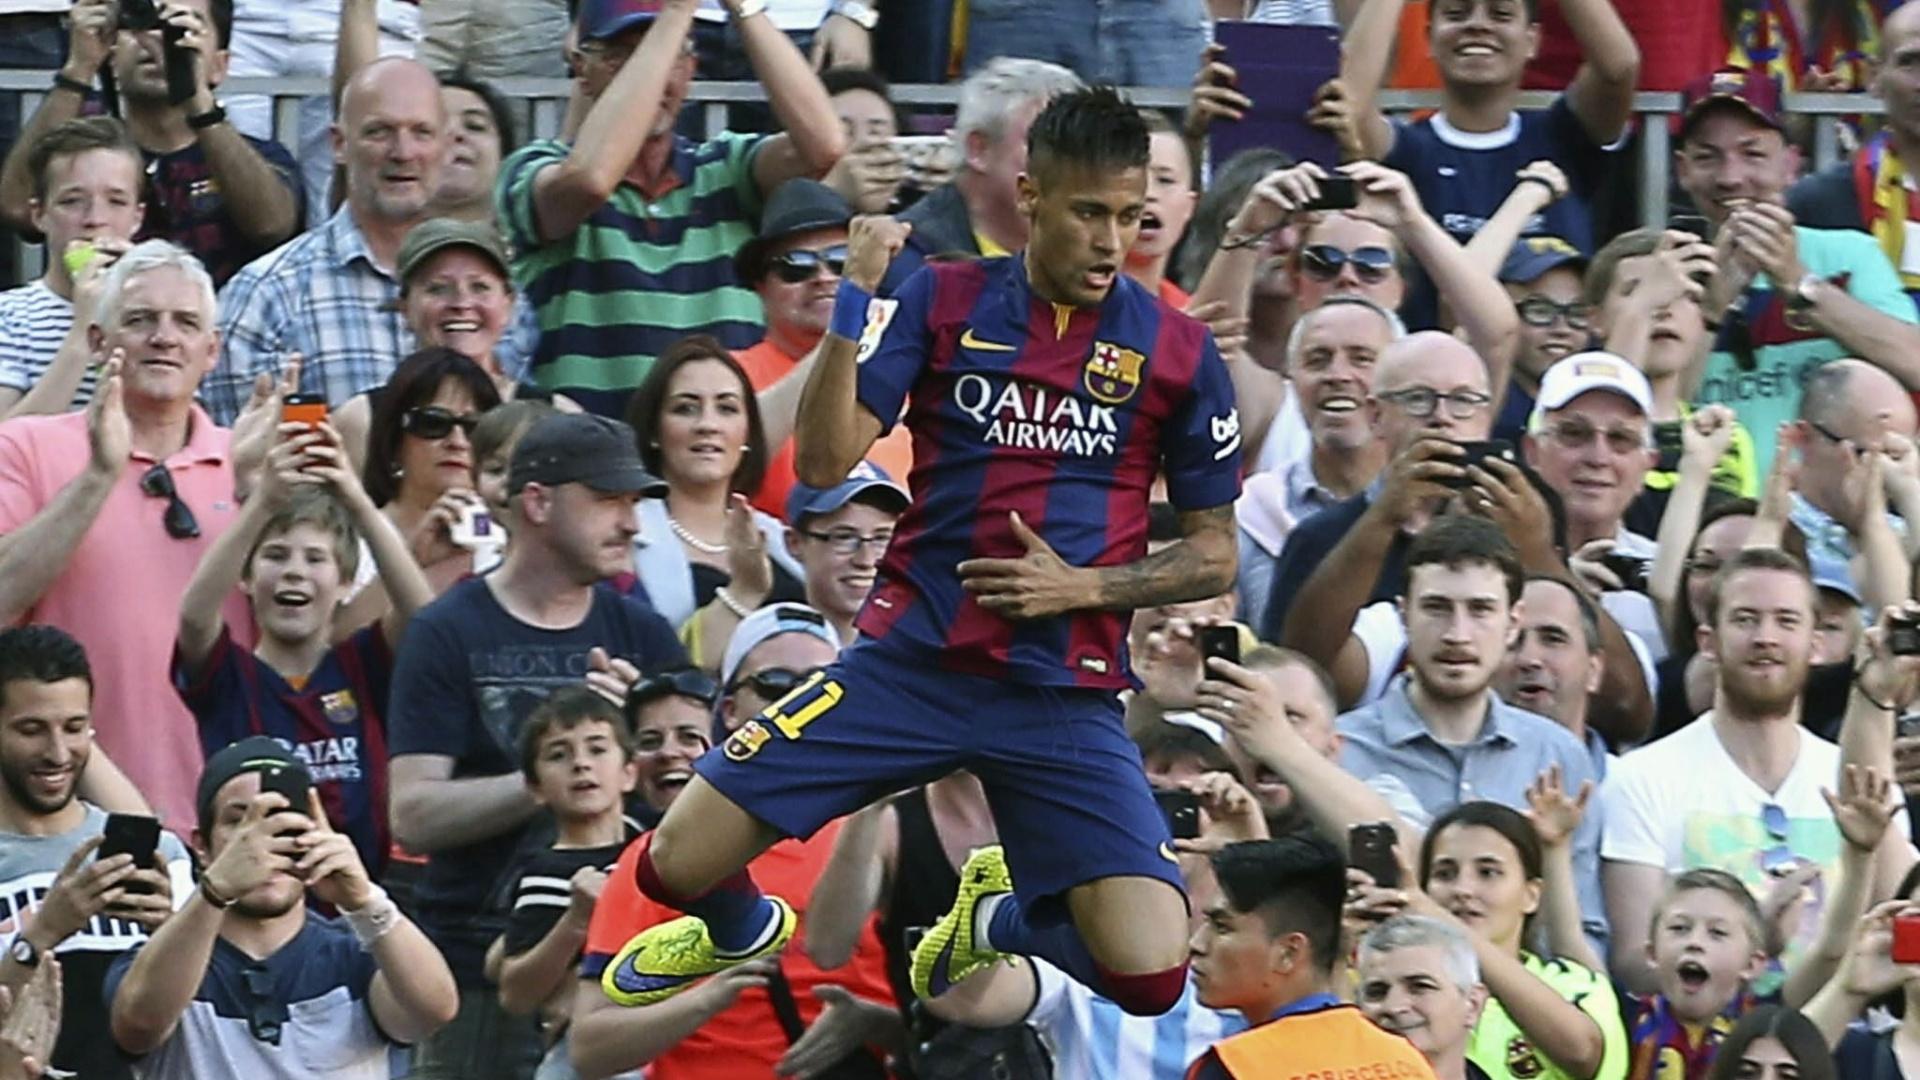 Neymar soca o ar após o gol e leva torcedores do Barcelona ao delírio